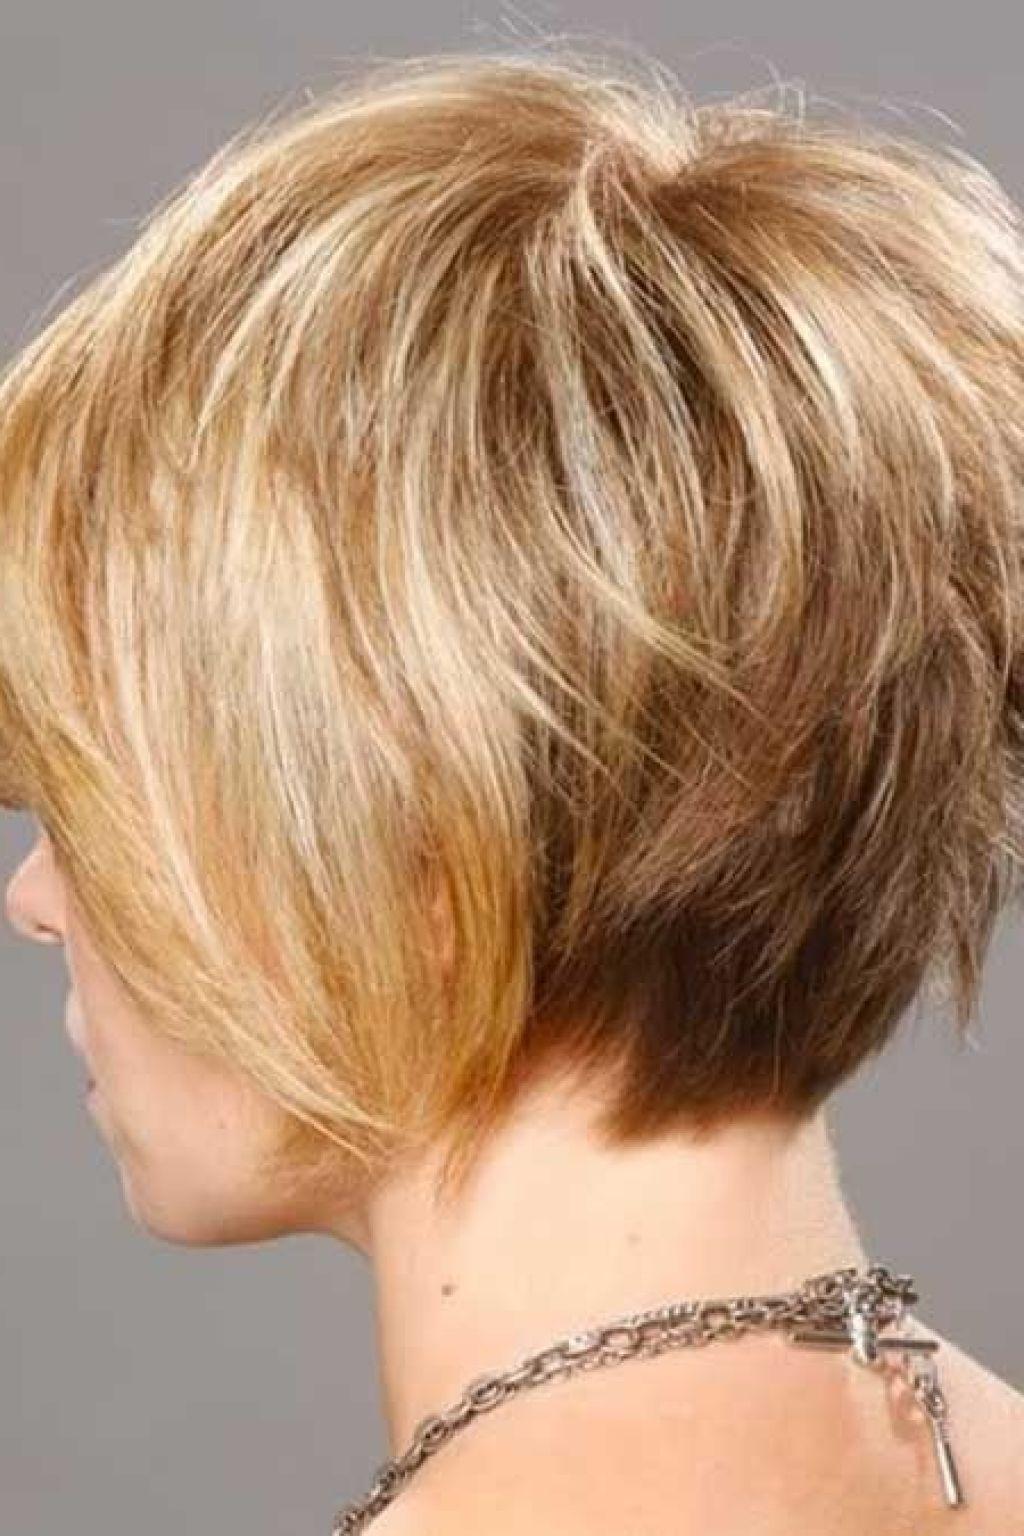 Bob Cuts For Thin Fine Hair Best Short Bob Hairstyles For Fine